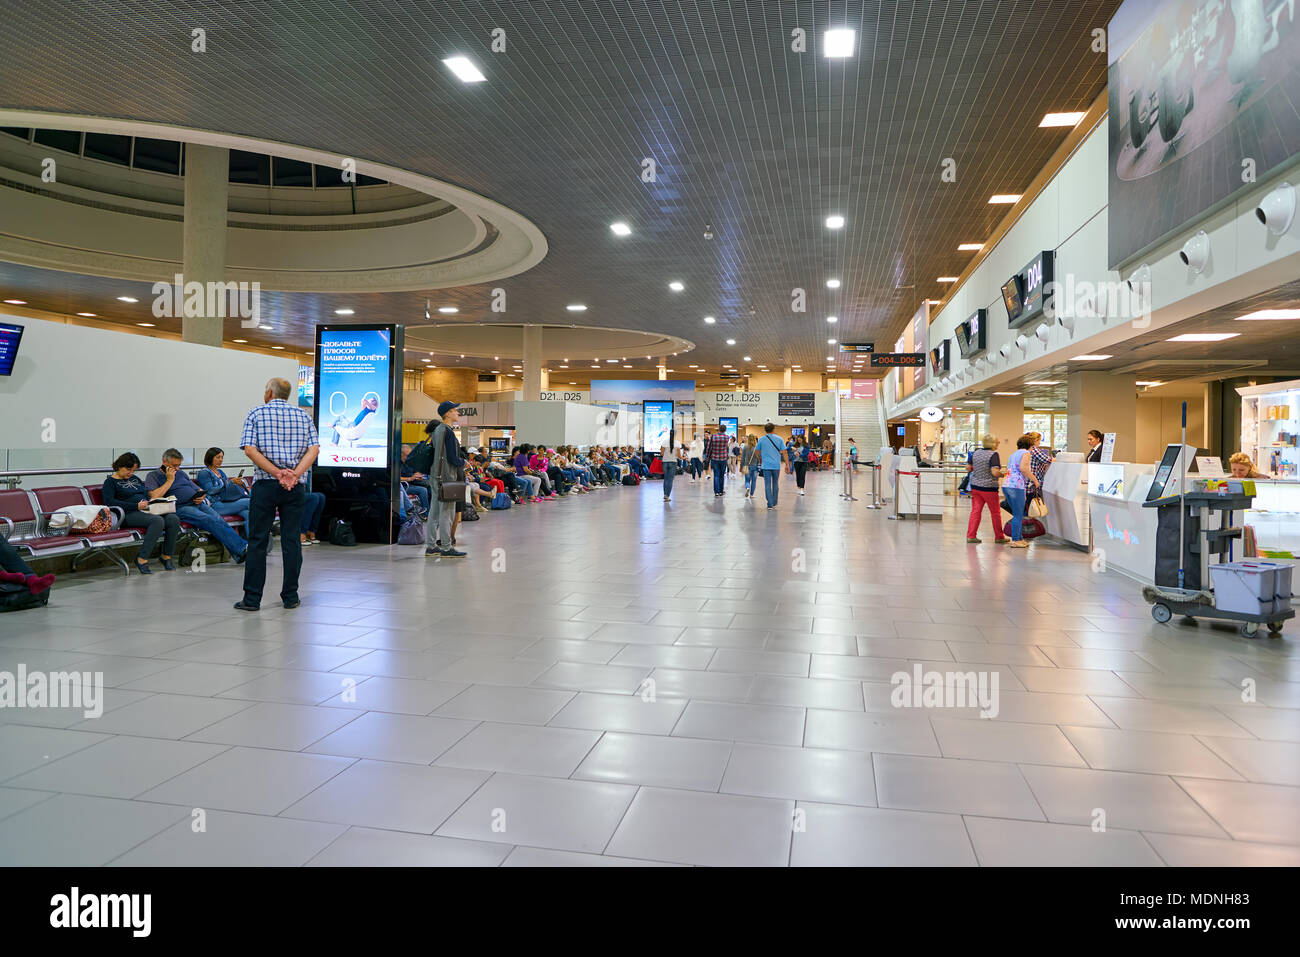 Pulkovo International Airport: description and infrastructure 25